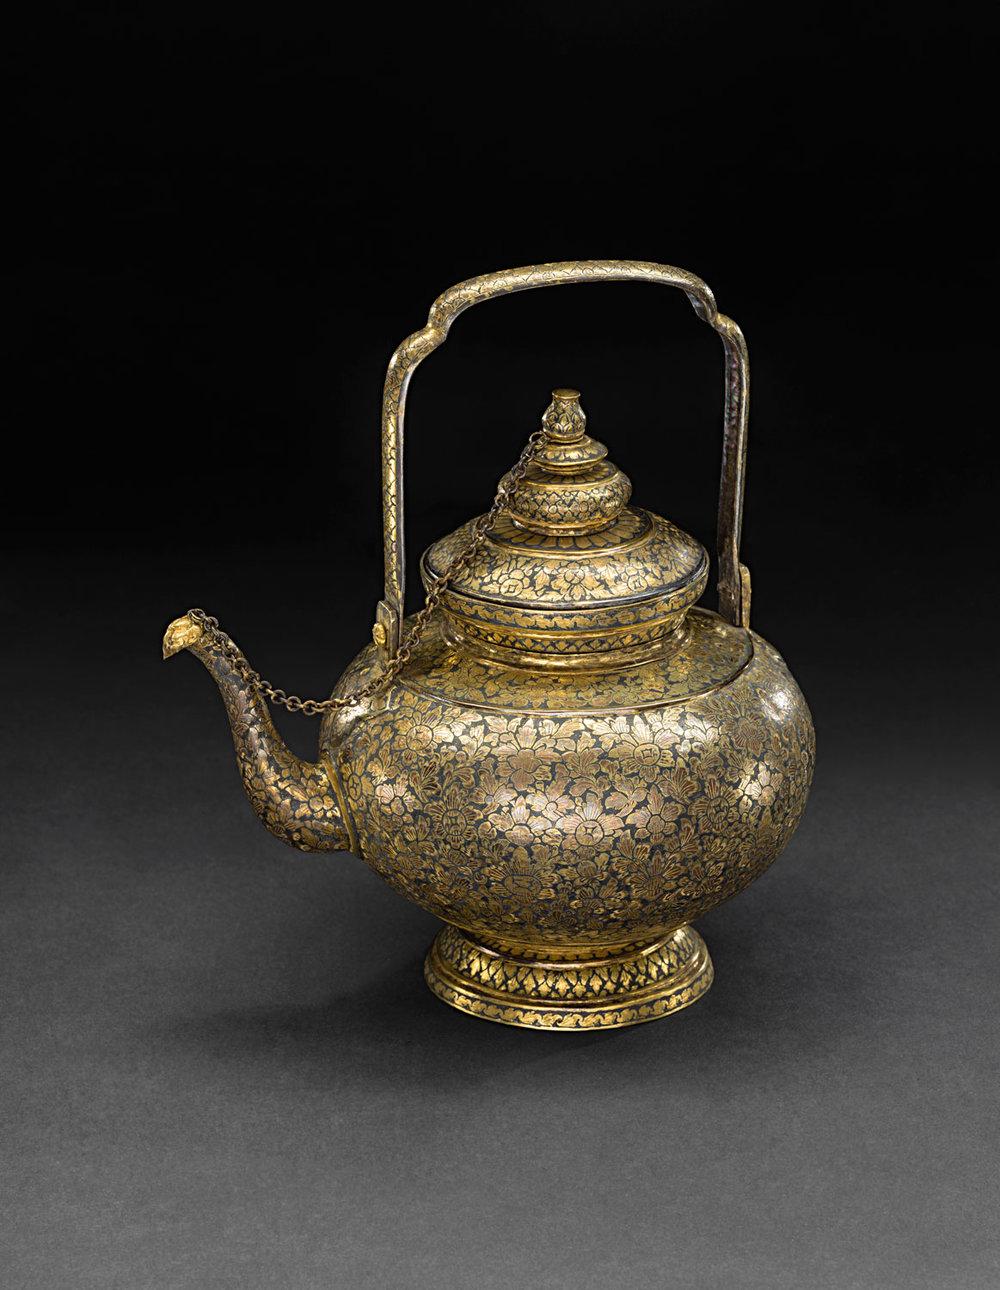 Gold Niello Waterpot Gift from King Chulalongkorn to the Smithsonian Institution, 1876 24 cm height x 16 cm diameter Courtesy of the Smithsonian Institution, Department of Anthropology; E27155-0; Photo by Jim Di Loreto  กาน้ำถมตะทอง ของขวัญพระราชทานจากพระบาทสมเด็จพระจุลจอมเกล้าเจ้าอยู่หัวแก่สถาบันสมิธโซเนียน พ.ศ. 2419 สูง 24 ซม. เส้นผ่านศูนย์กลาง 16 ซม. ได้รับความอนุเคราะห์จากฝ่ายมานุษยวิทยา สถาบันสมิธโซเนียน; E27155-0; ภาพถ่ายของจิม ดิลอเรโต